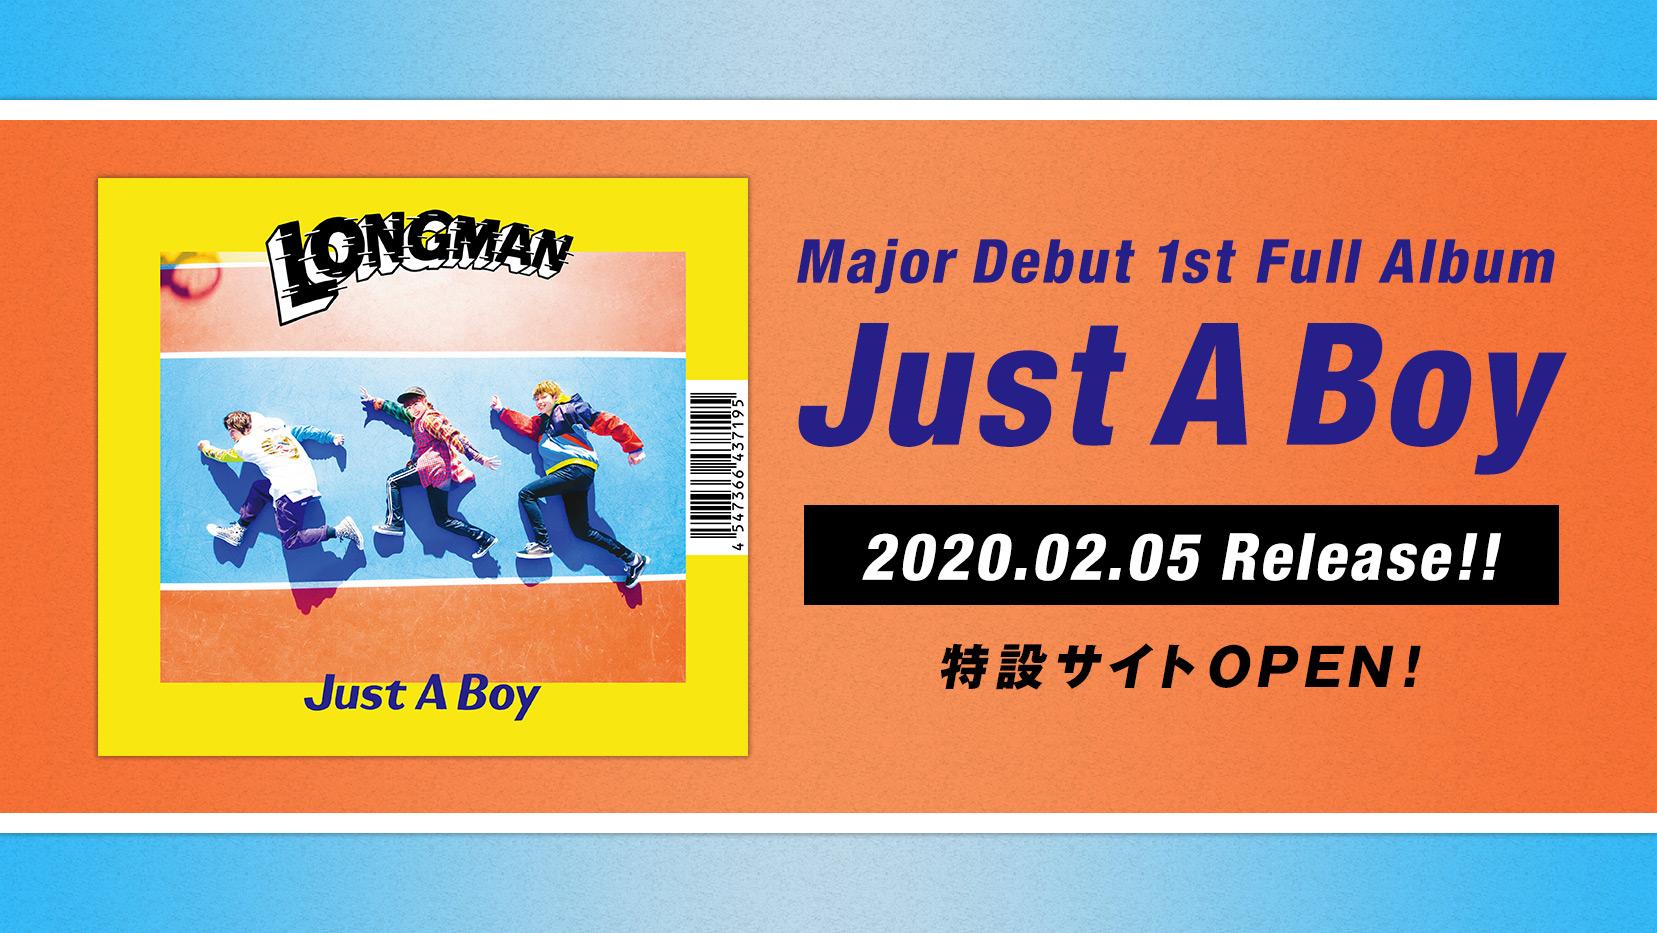 「Just A Boy」特設